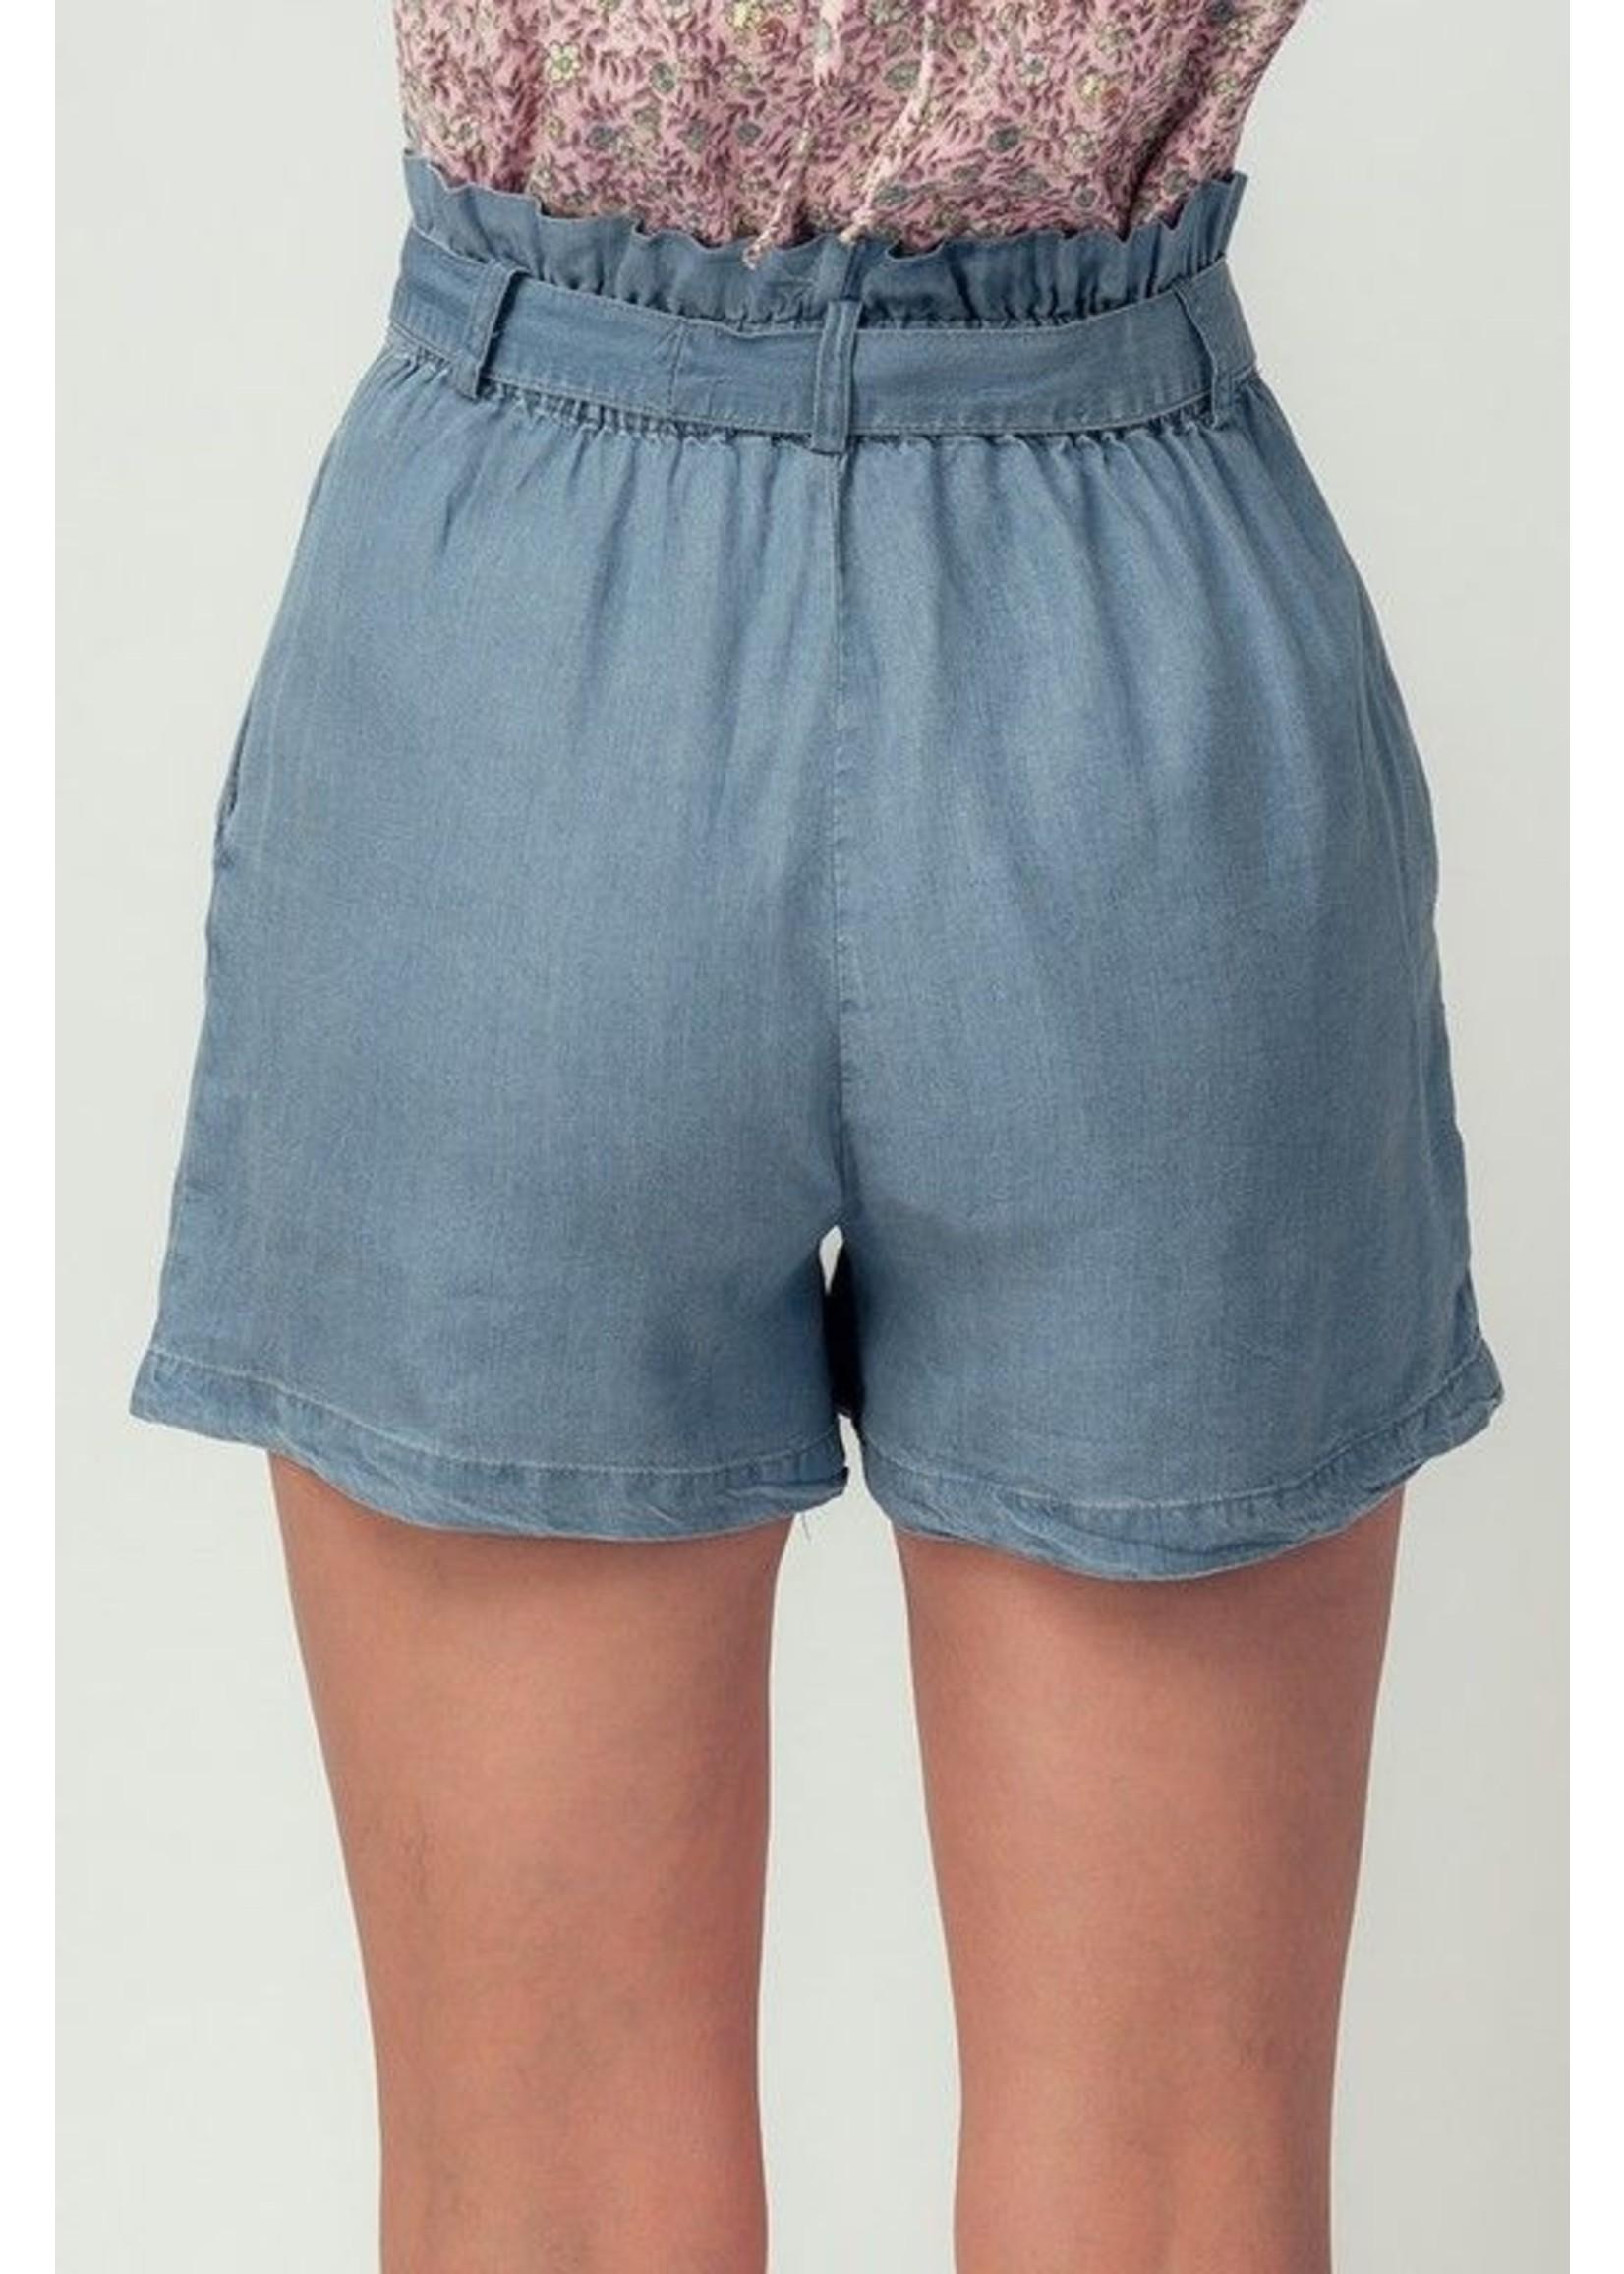 trend : notes Casidi Paper Bag Shorts Blue